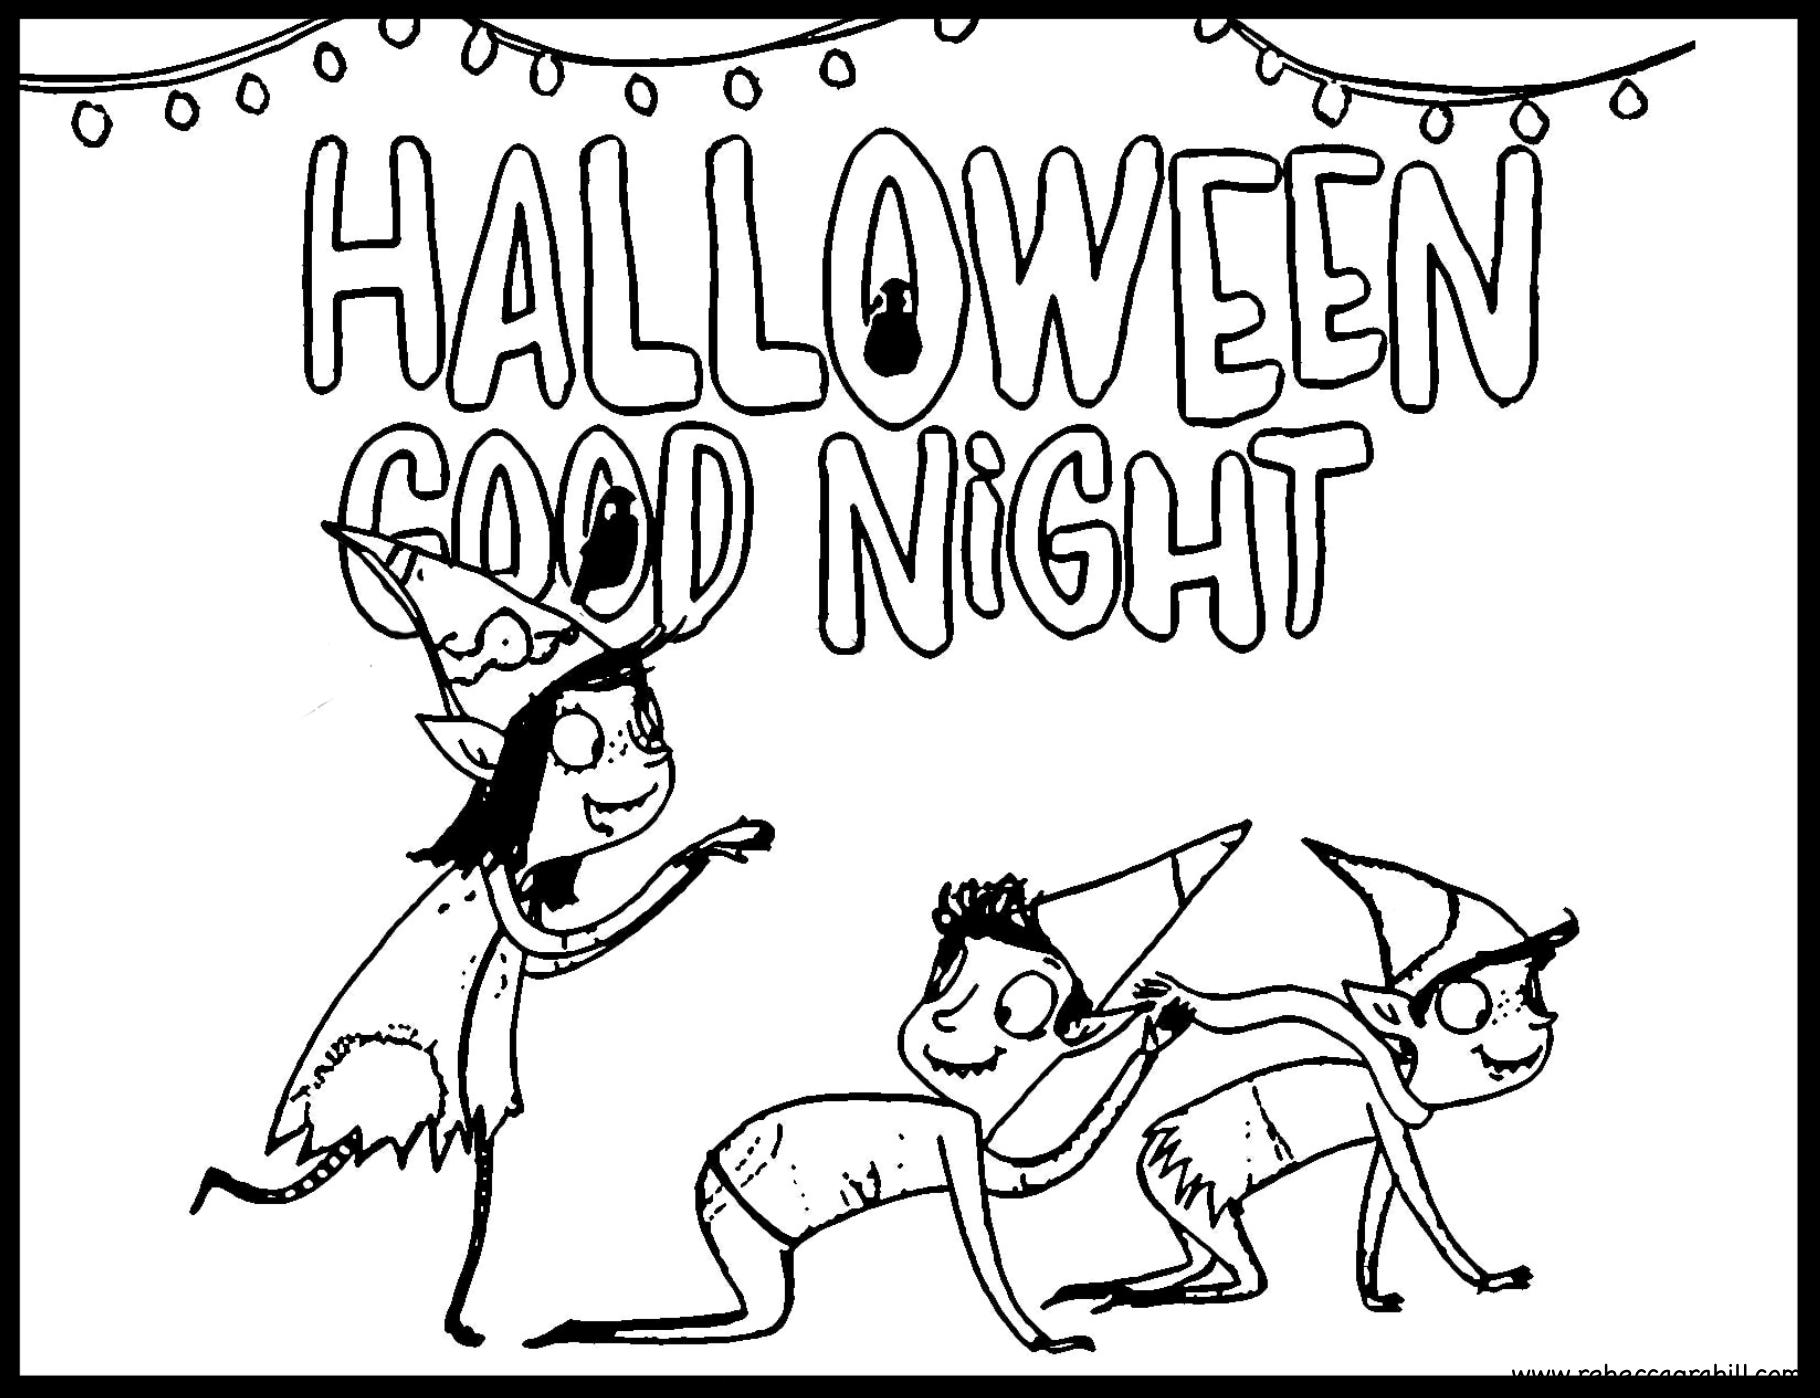 Halloween Good Night Coloring Page Printable Free